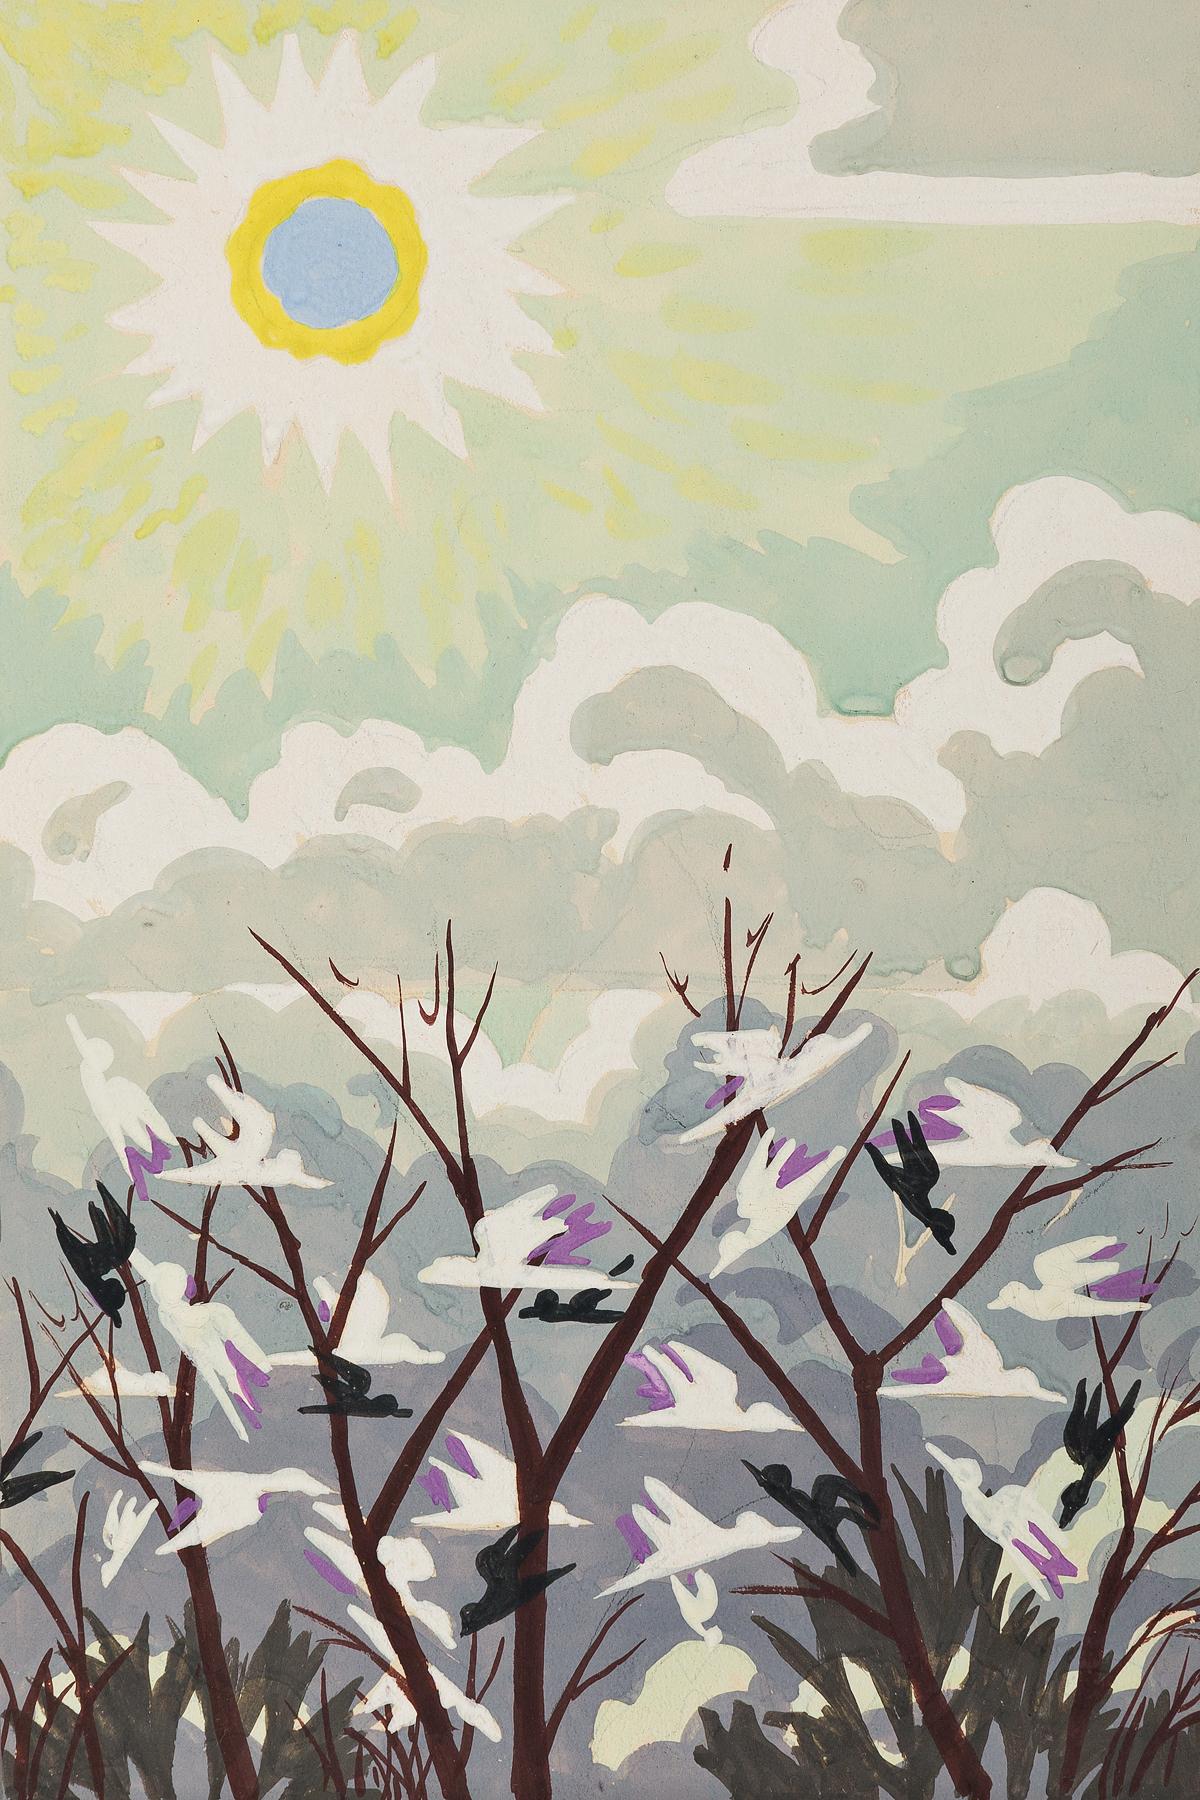 CHARLES-BURCHFIELD-Untitled-(Harmony-in-Nature)